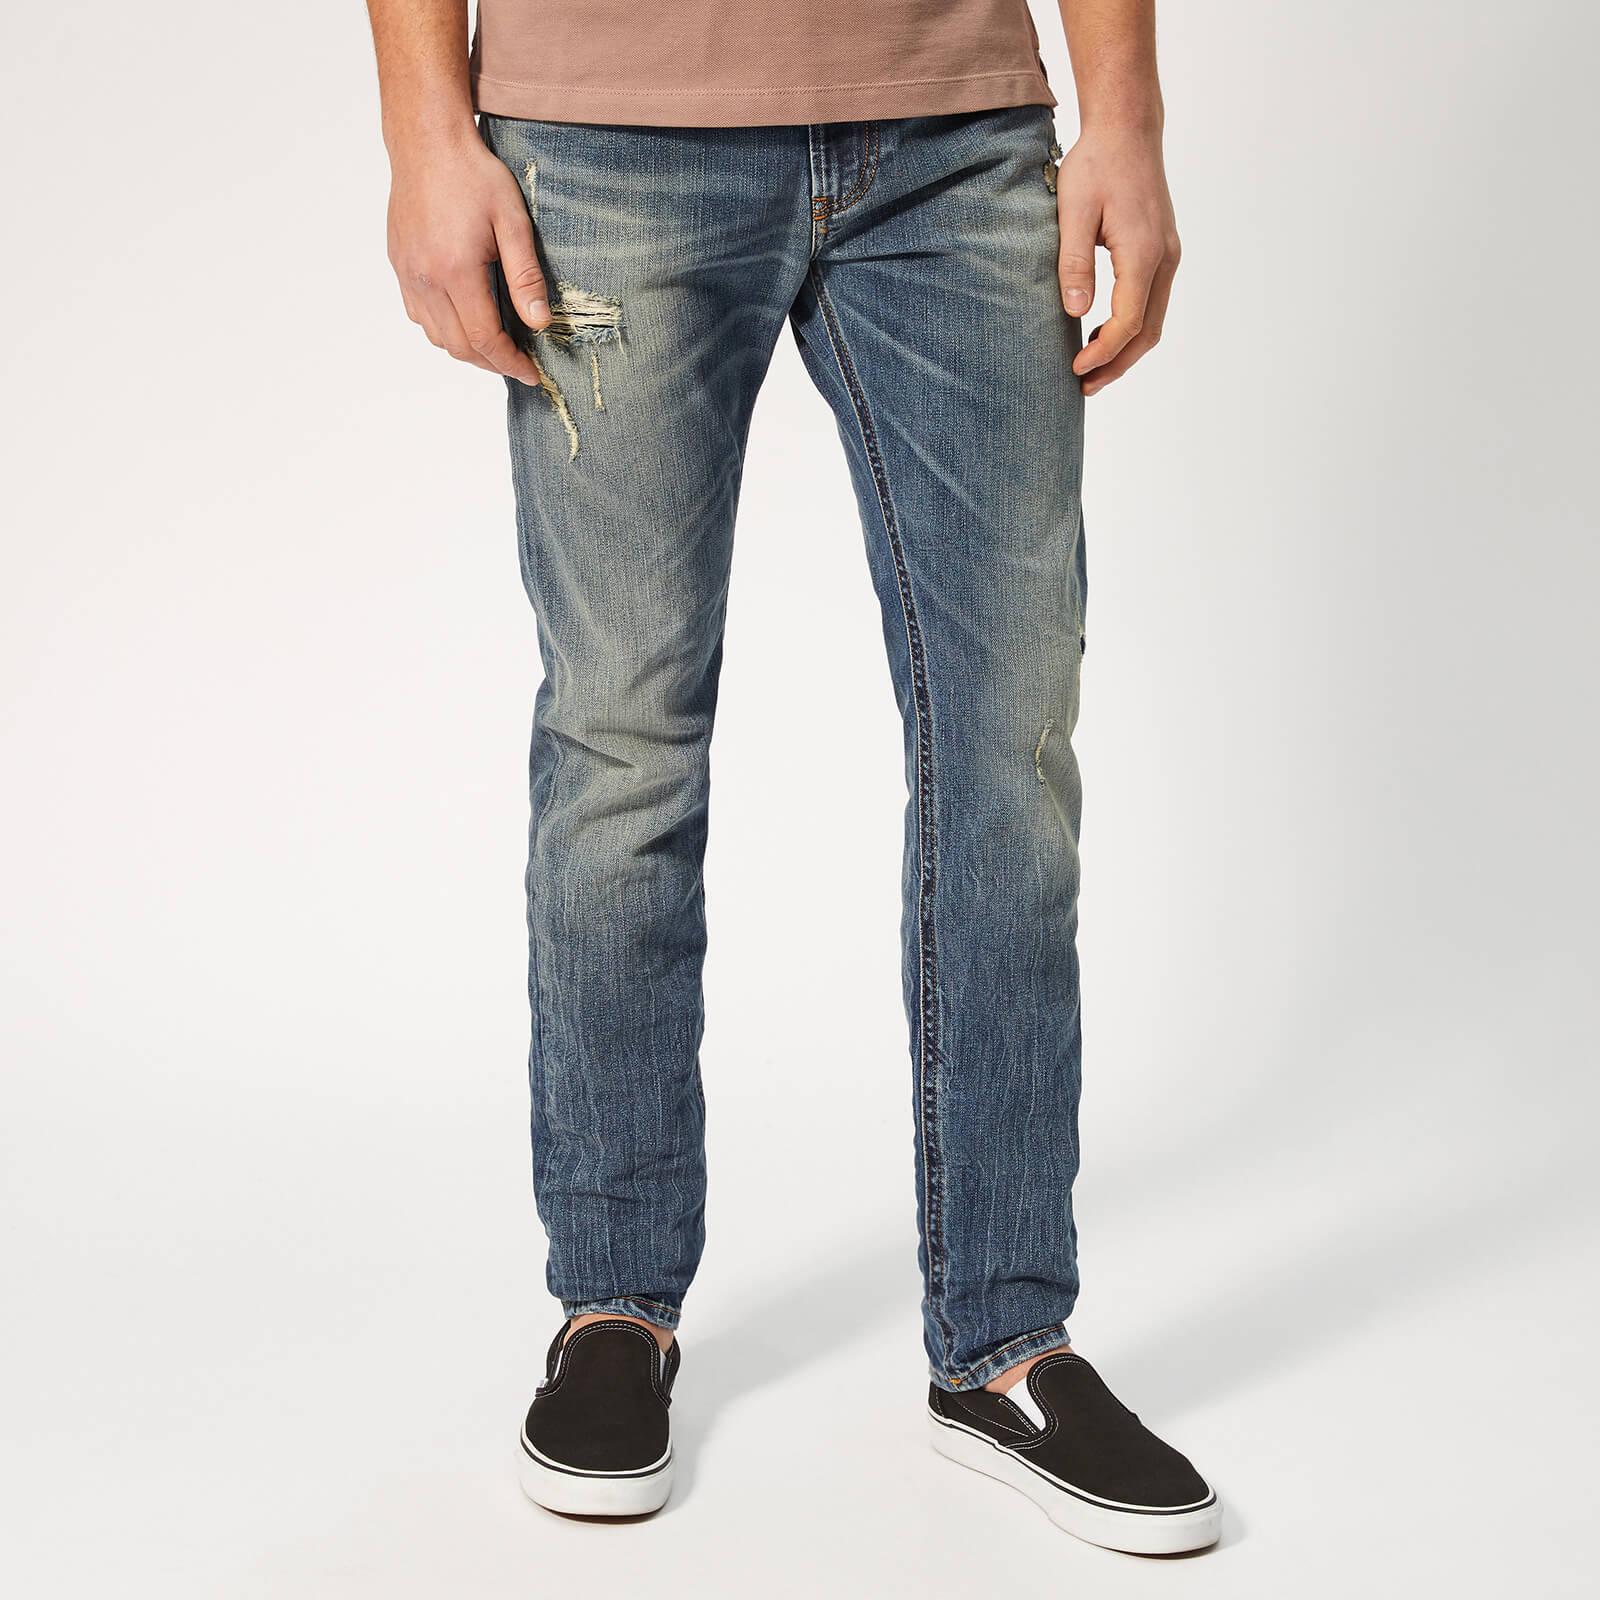 Diesel Men's Thommer Skinny Jeans - Blue - W34/L30 - Blue